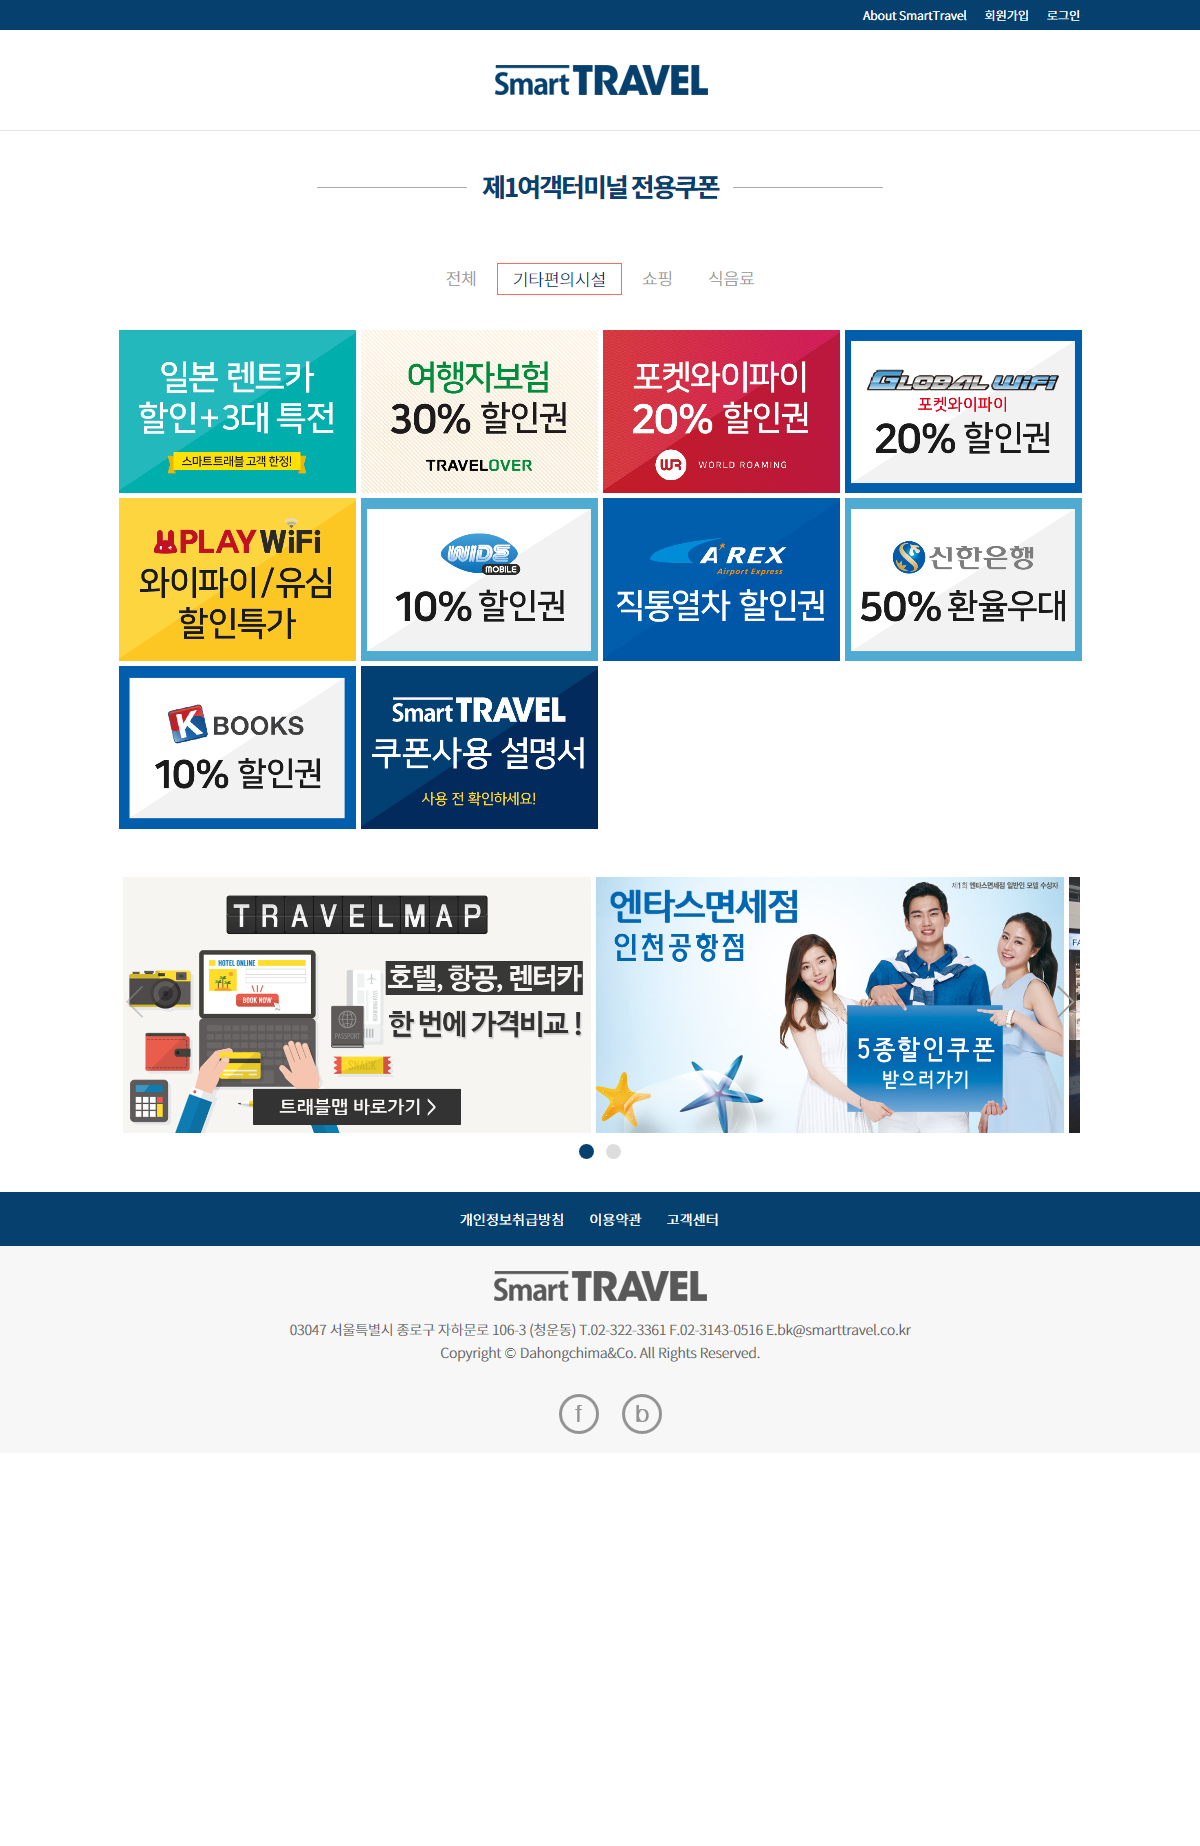 Screenshot-2018-1-26 제1여객터미널 전용쿠폰 Smart Travel(1)